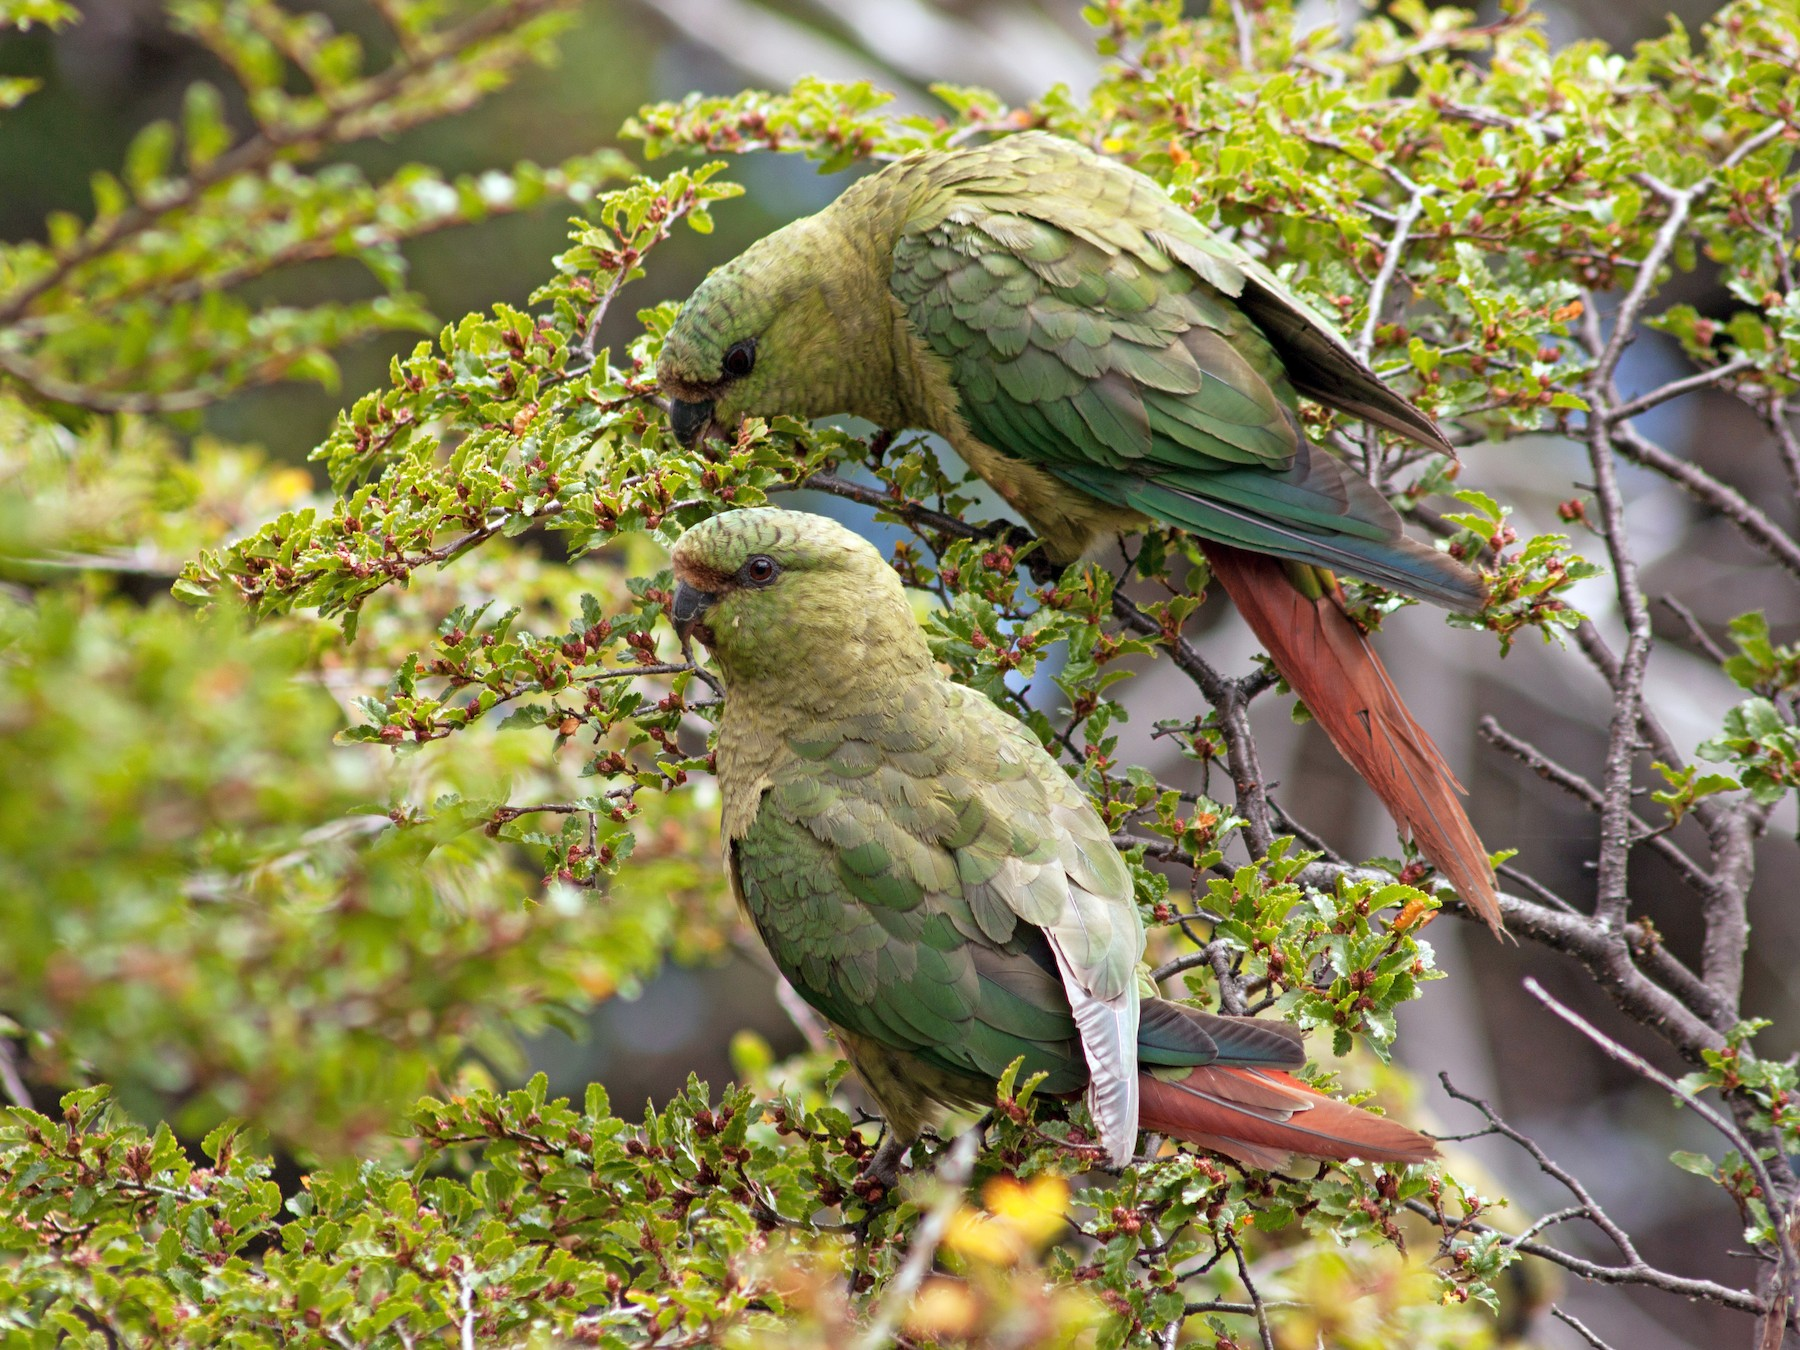 Austral Parakeet - Aina  Sandoval Murgan